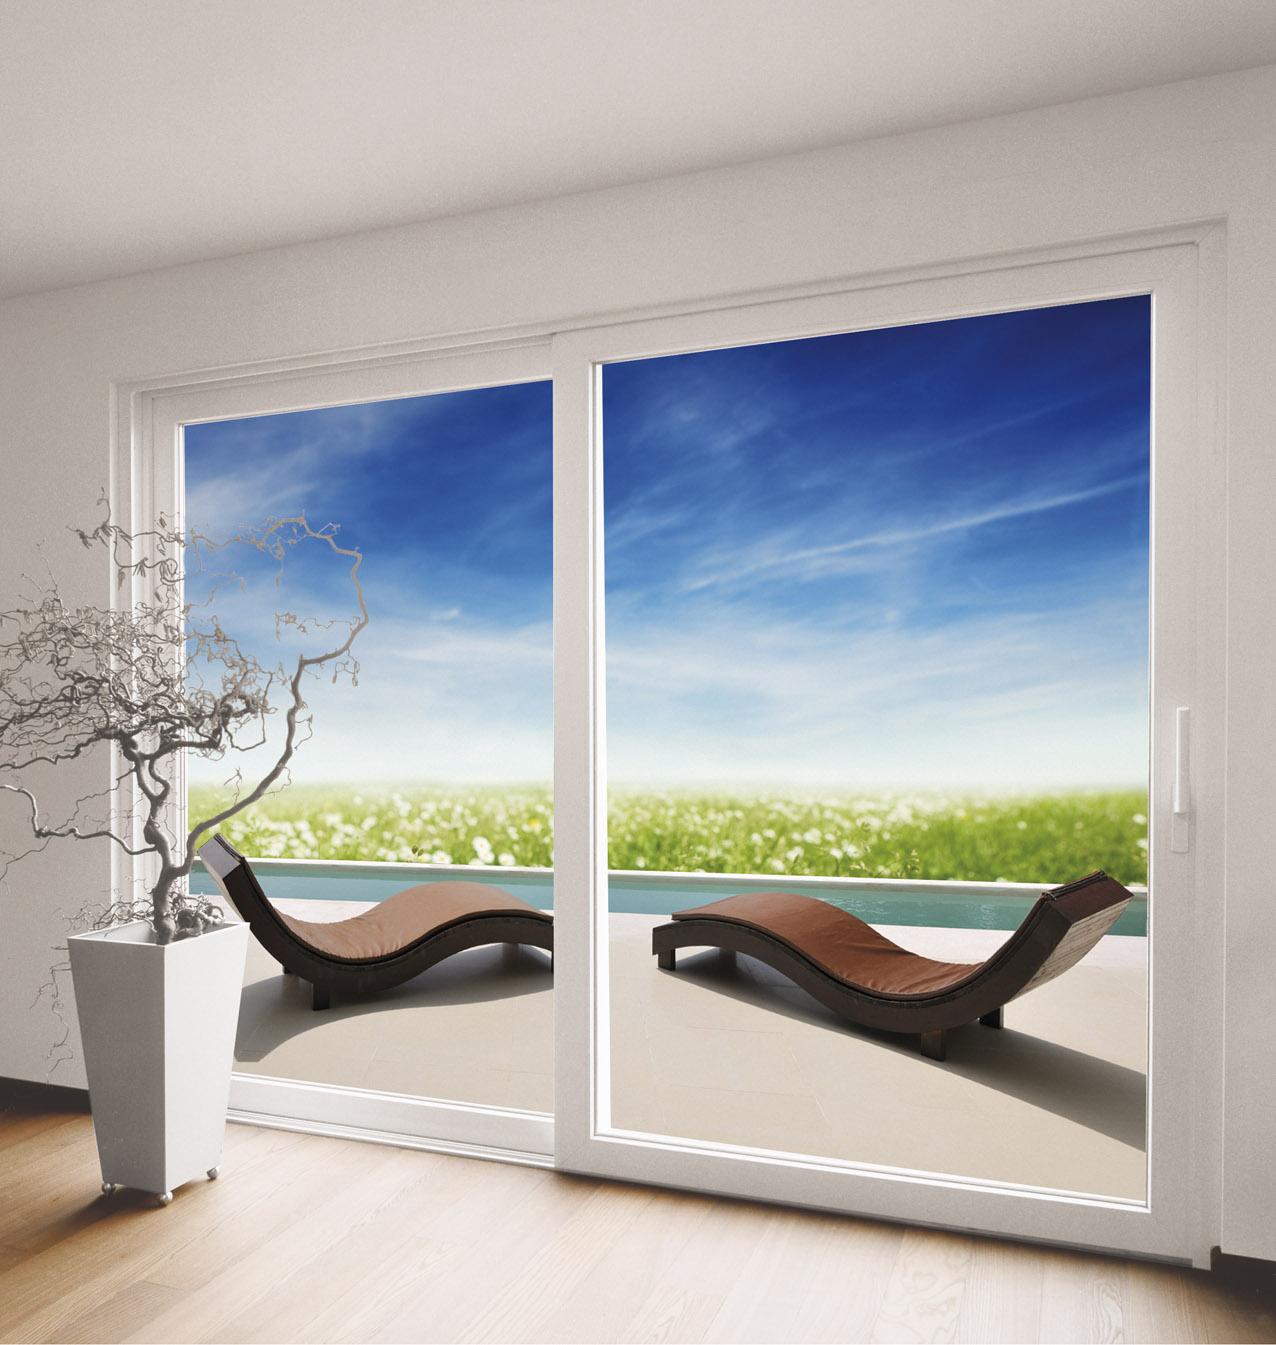 SYSTEM REHAU WINDOWS DOOR WINDOW SHADE WINTER GARDEN SYSTEMS #284084